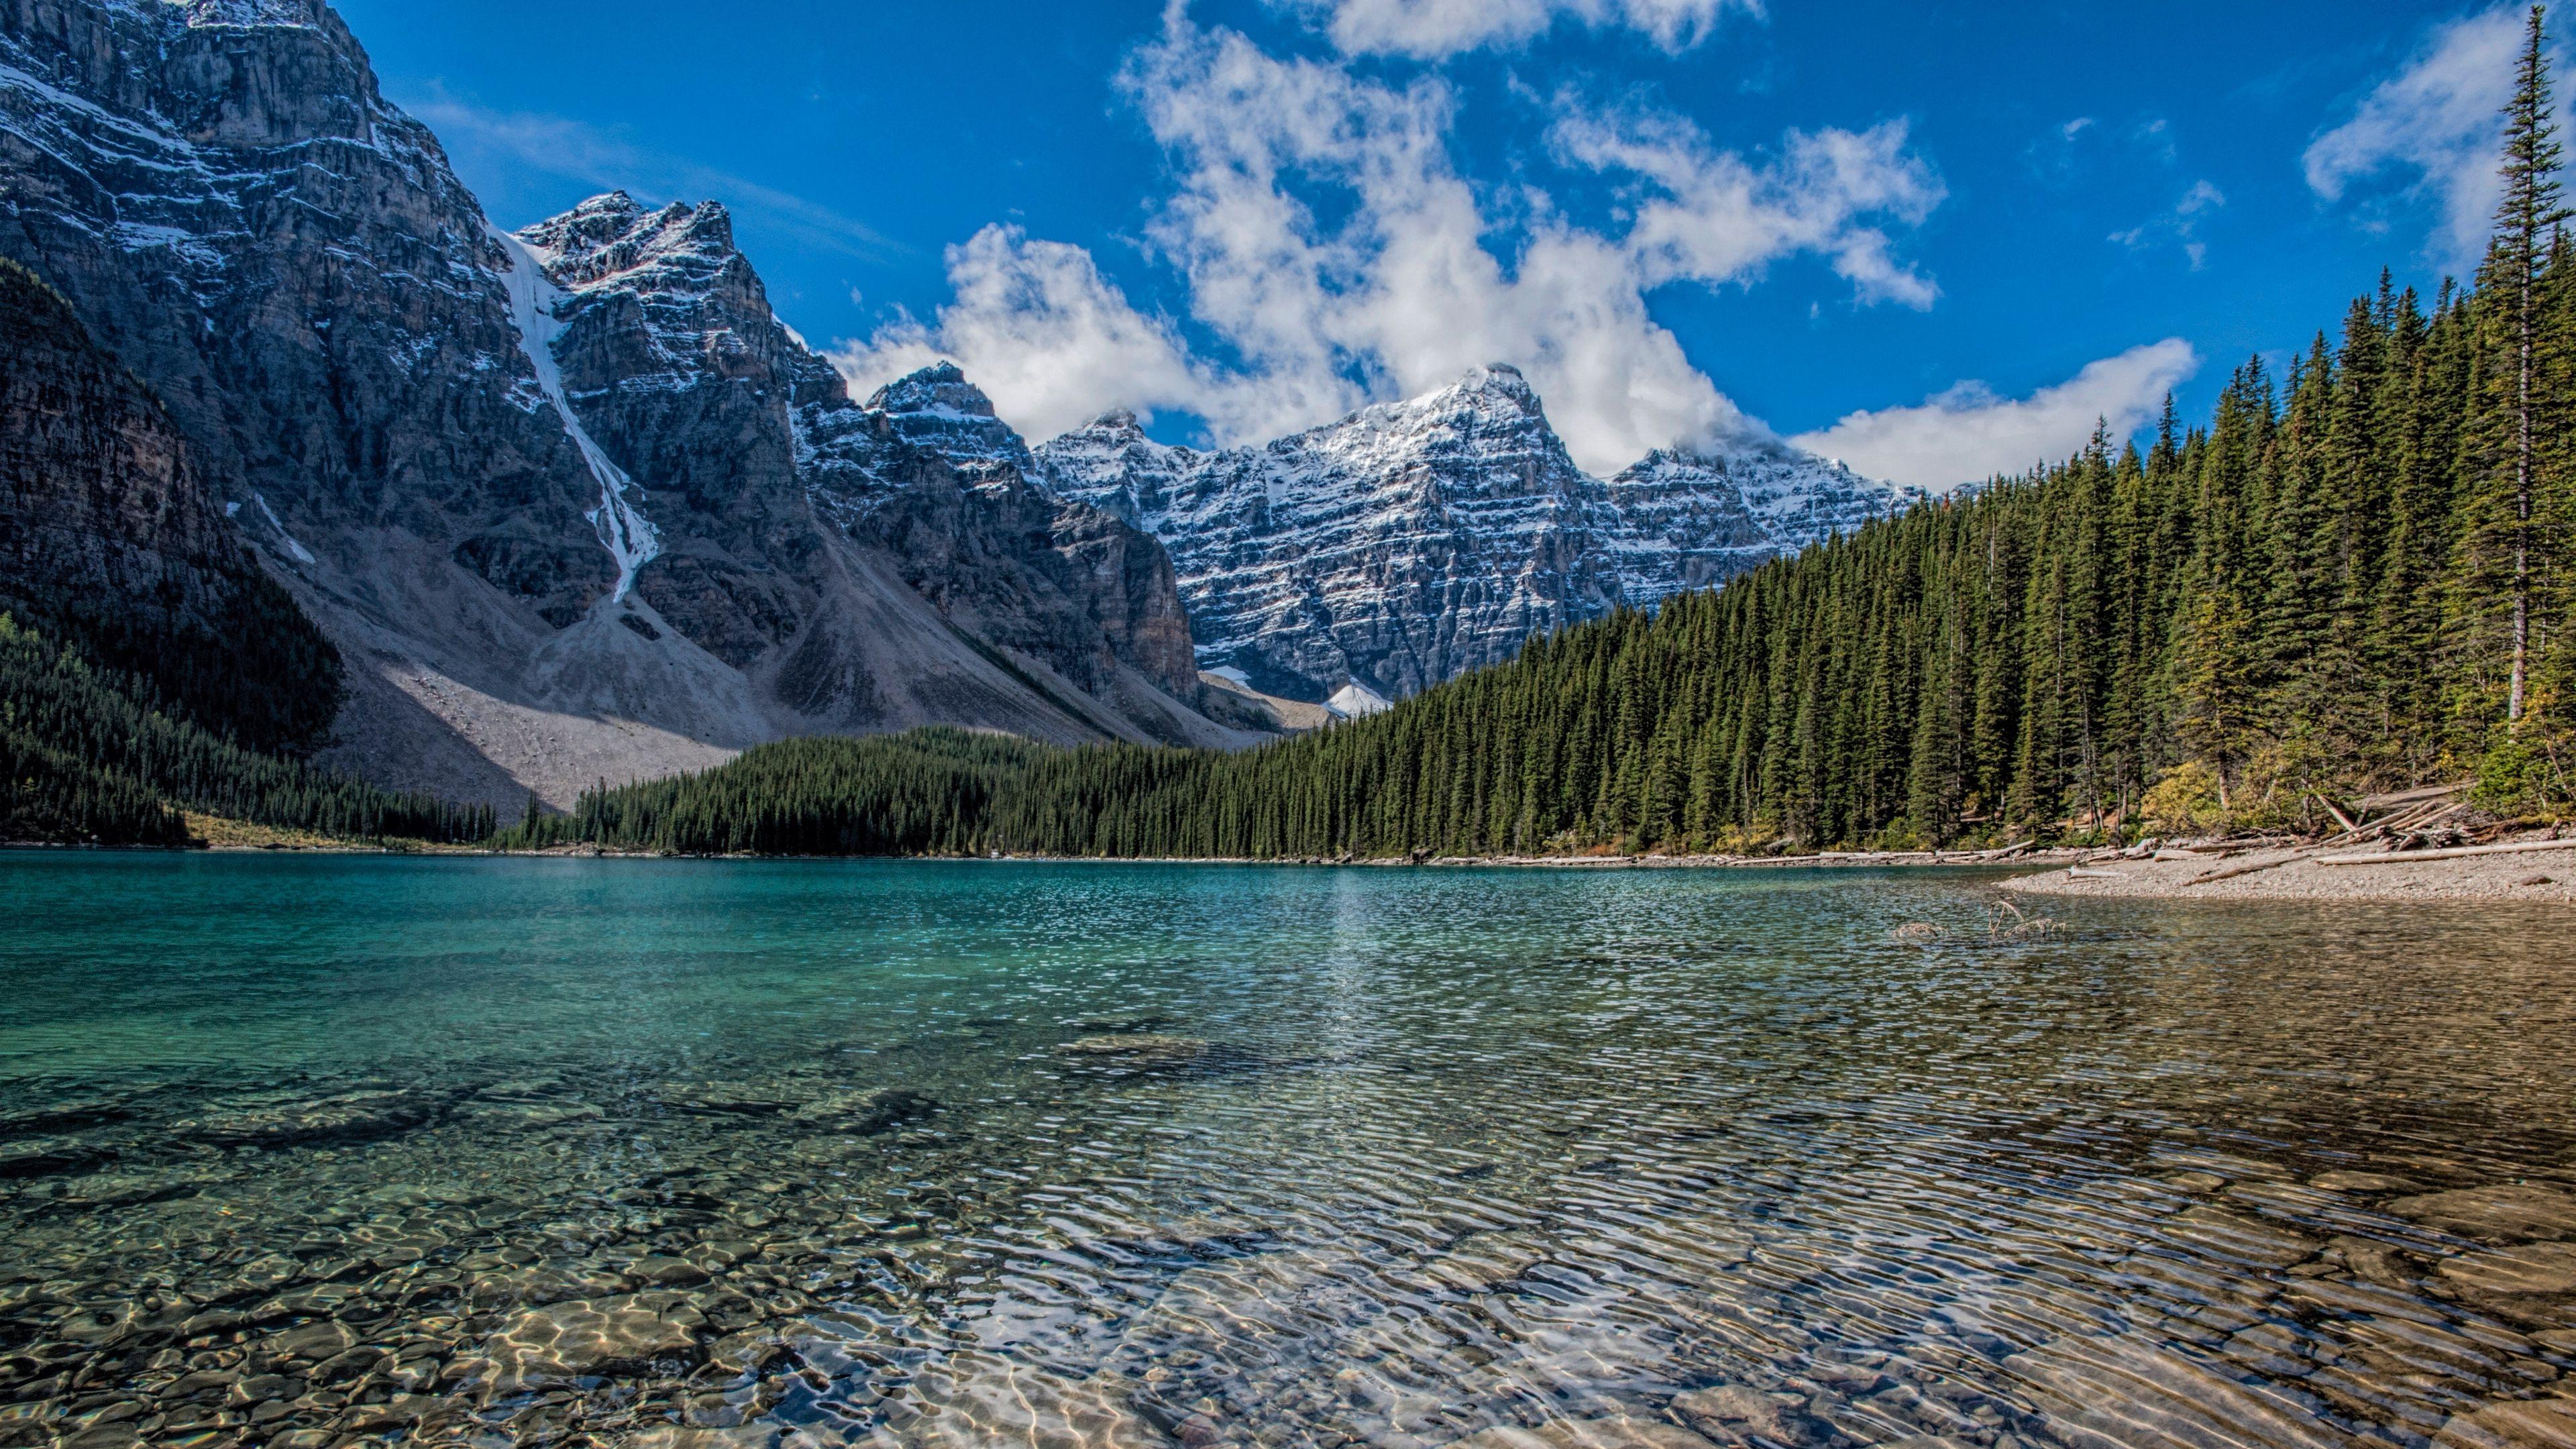 4k Lake Wallpapers Top Free 4k Lake Backgrounds